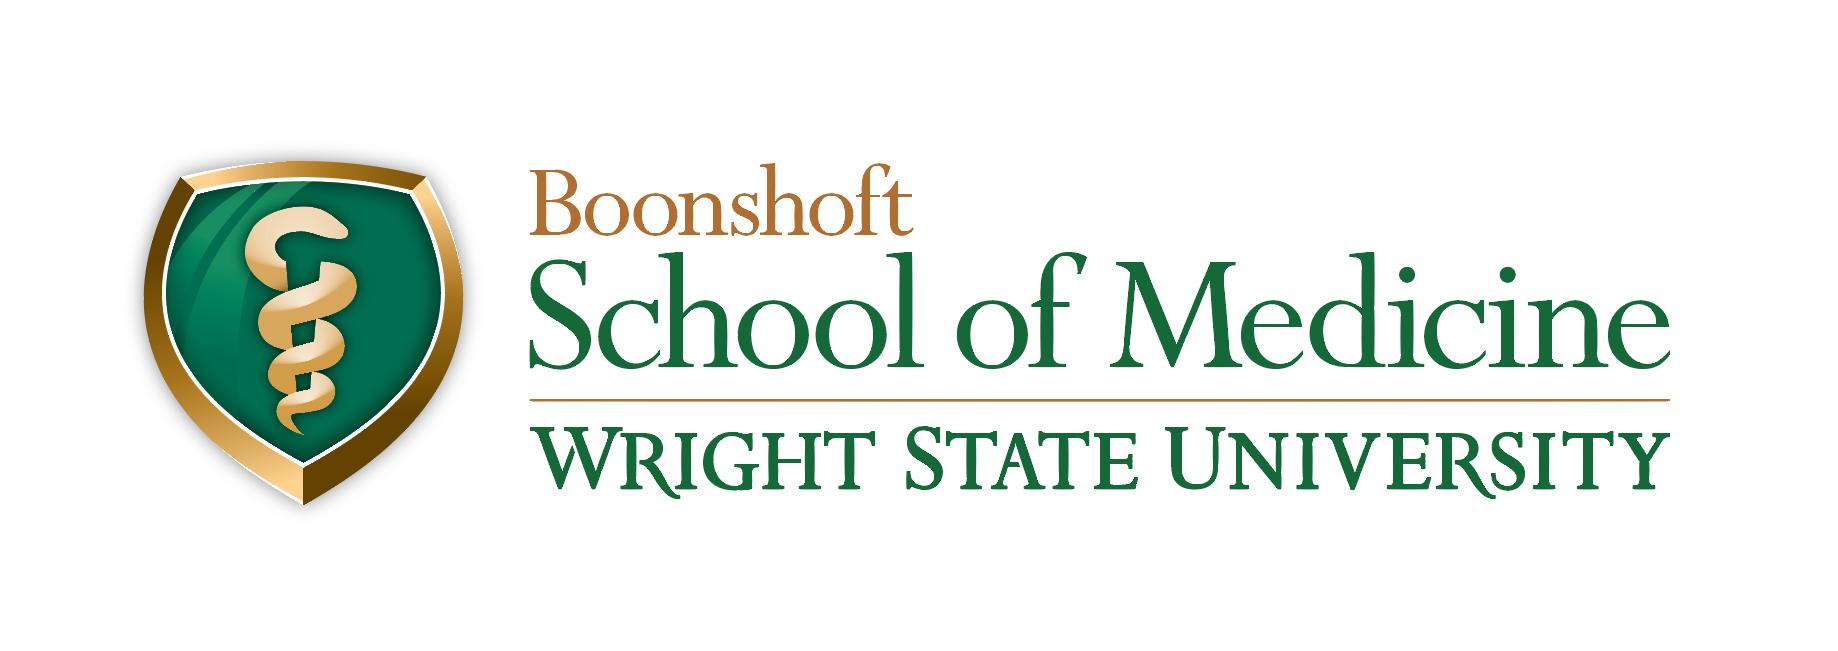 Brand Architecture - Boonshoft School of Medicine